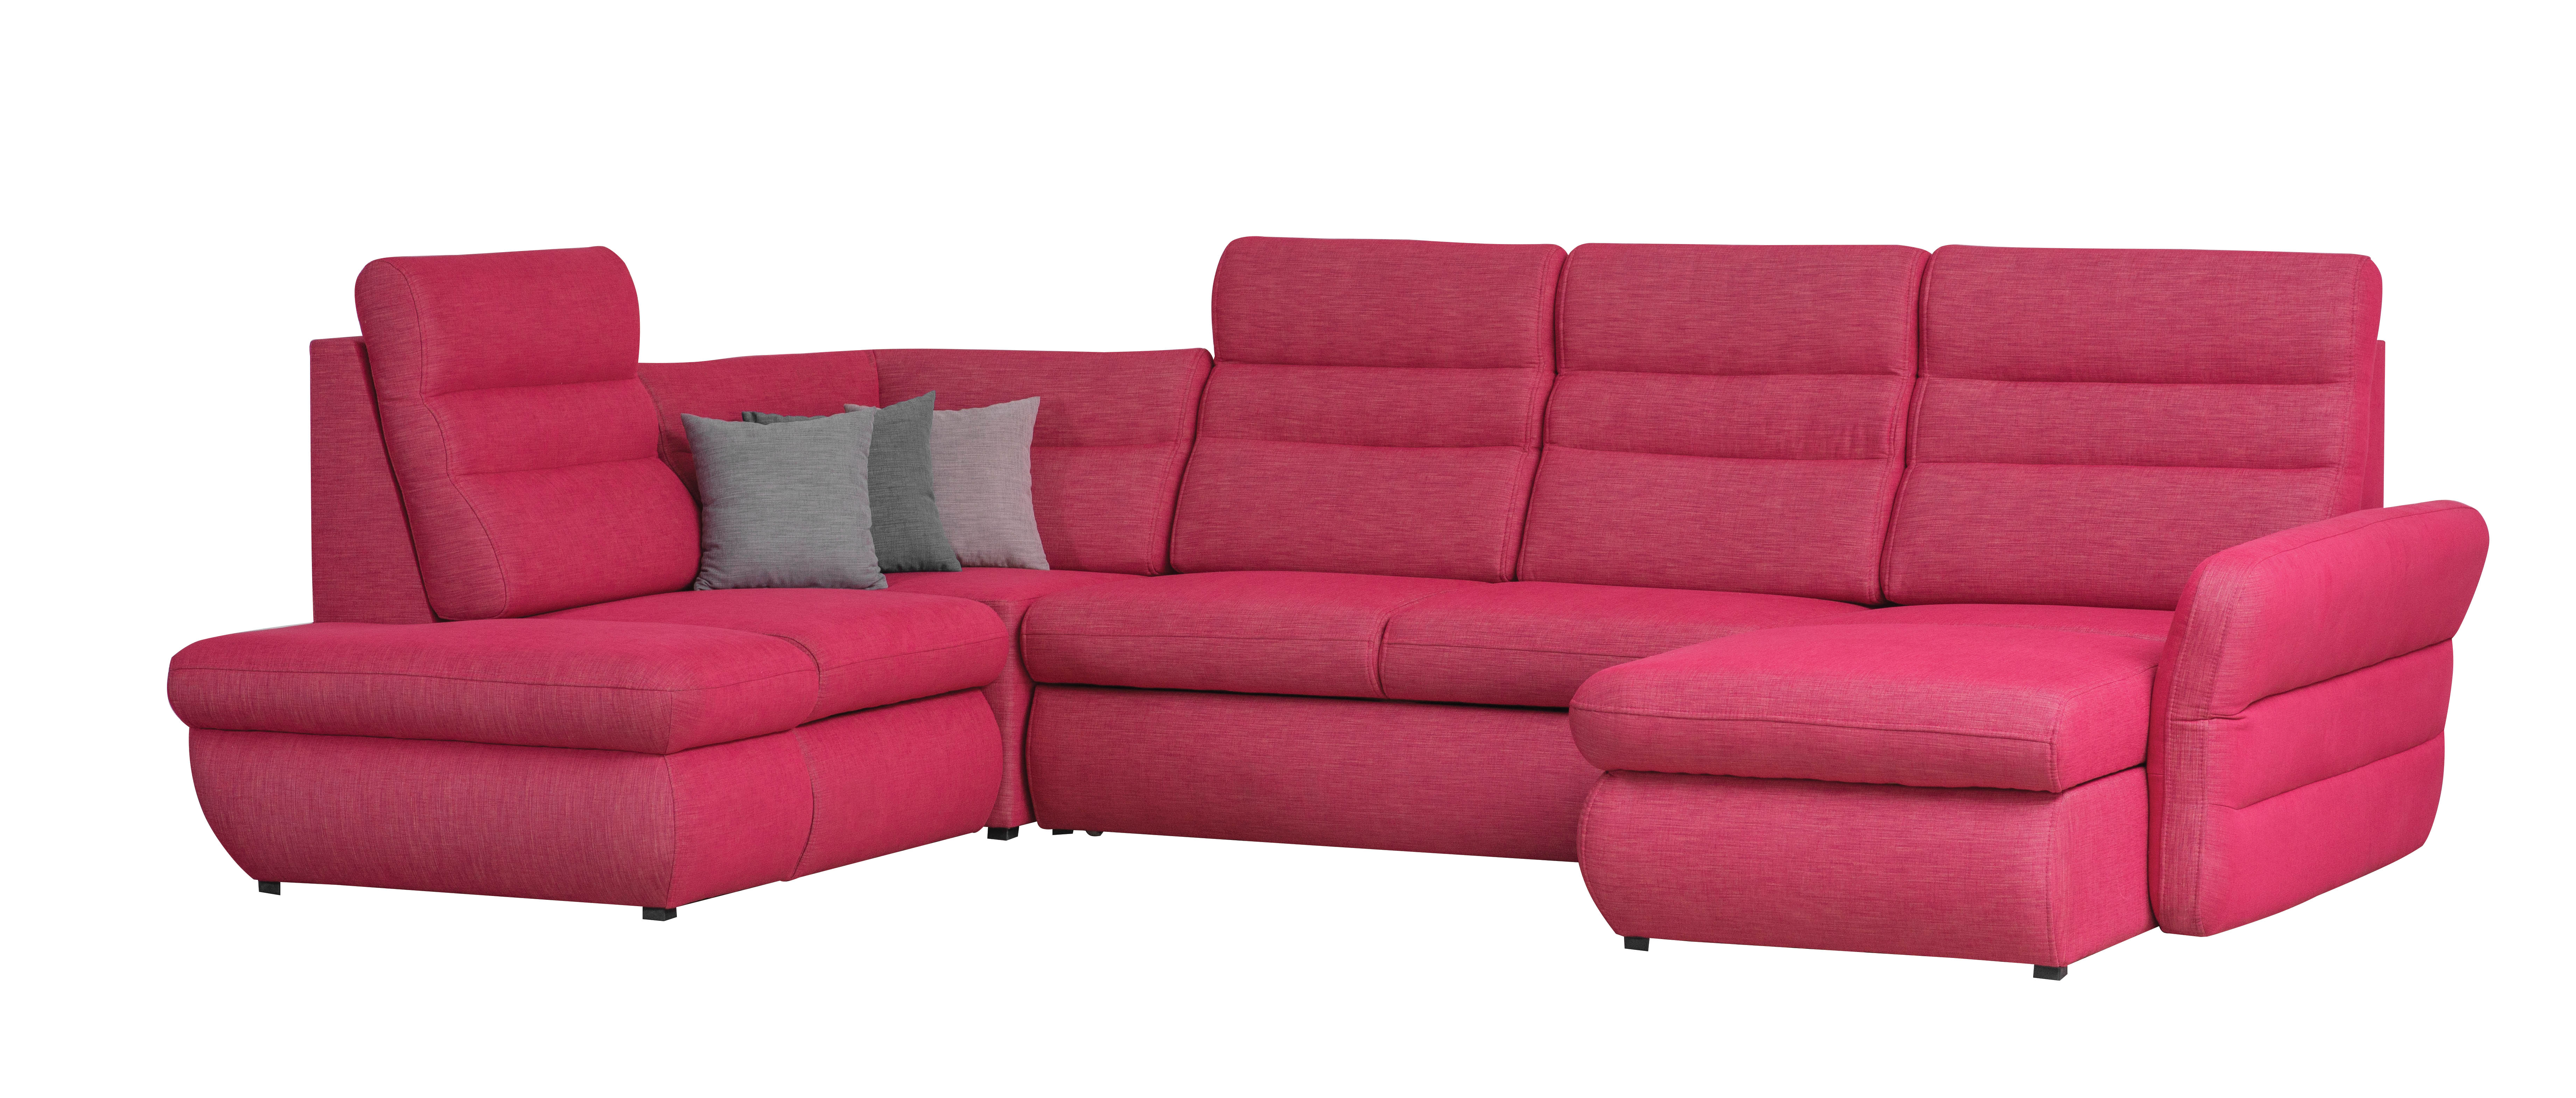 Coltar extensibil cu lada de depozitare, cu sezlong pe stanga Jazz Pink, l335xA217xH106 cm